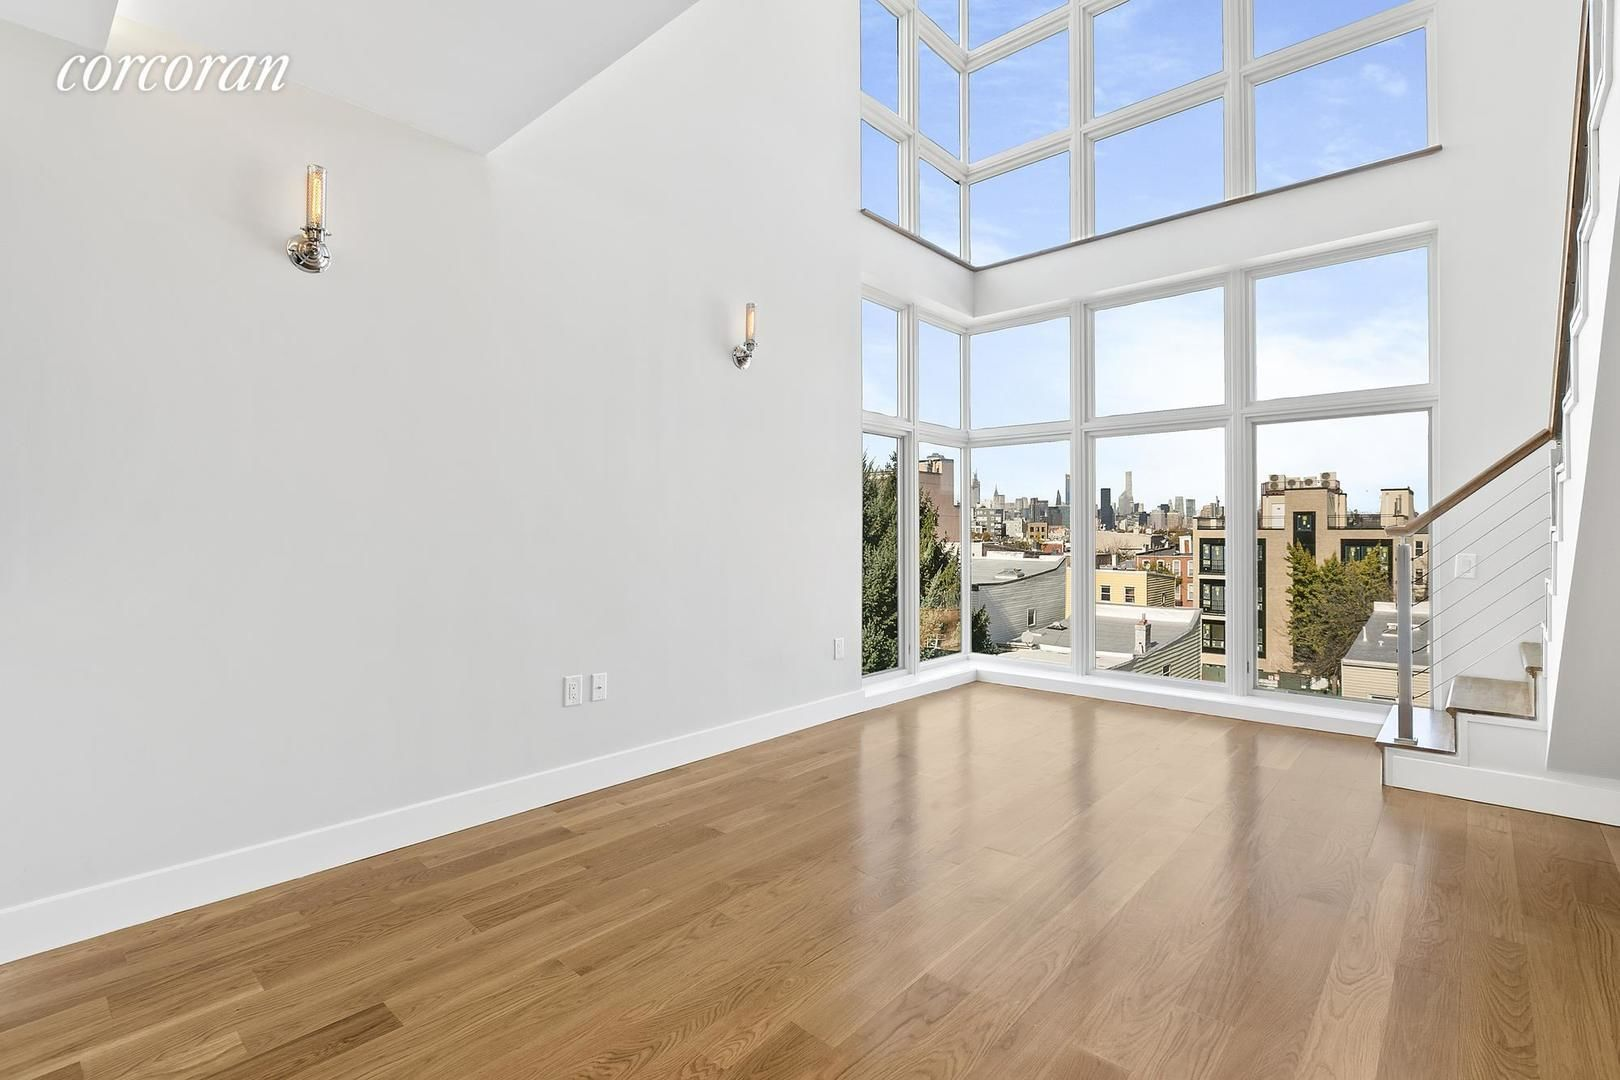 Apartment for sale at 175 Jackson Street, Apt 2D